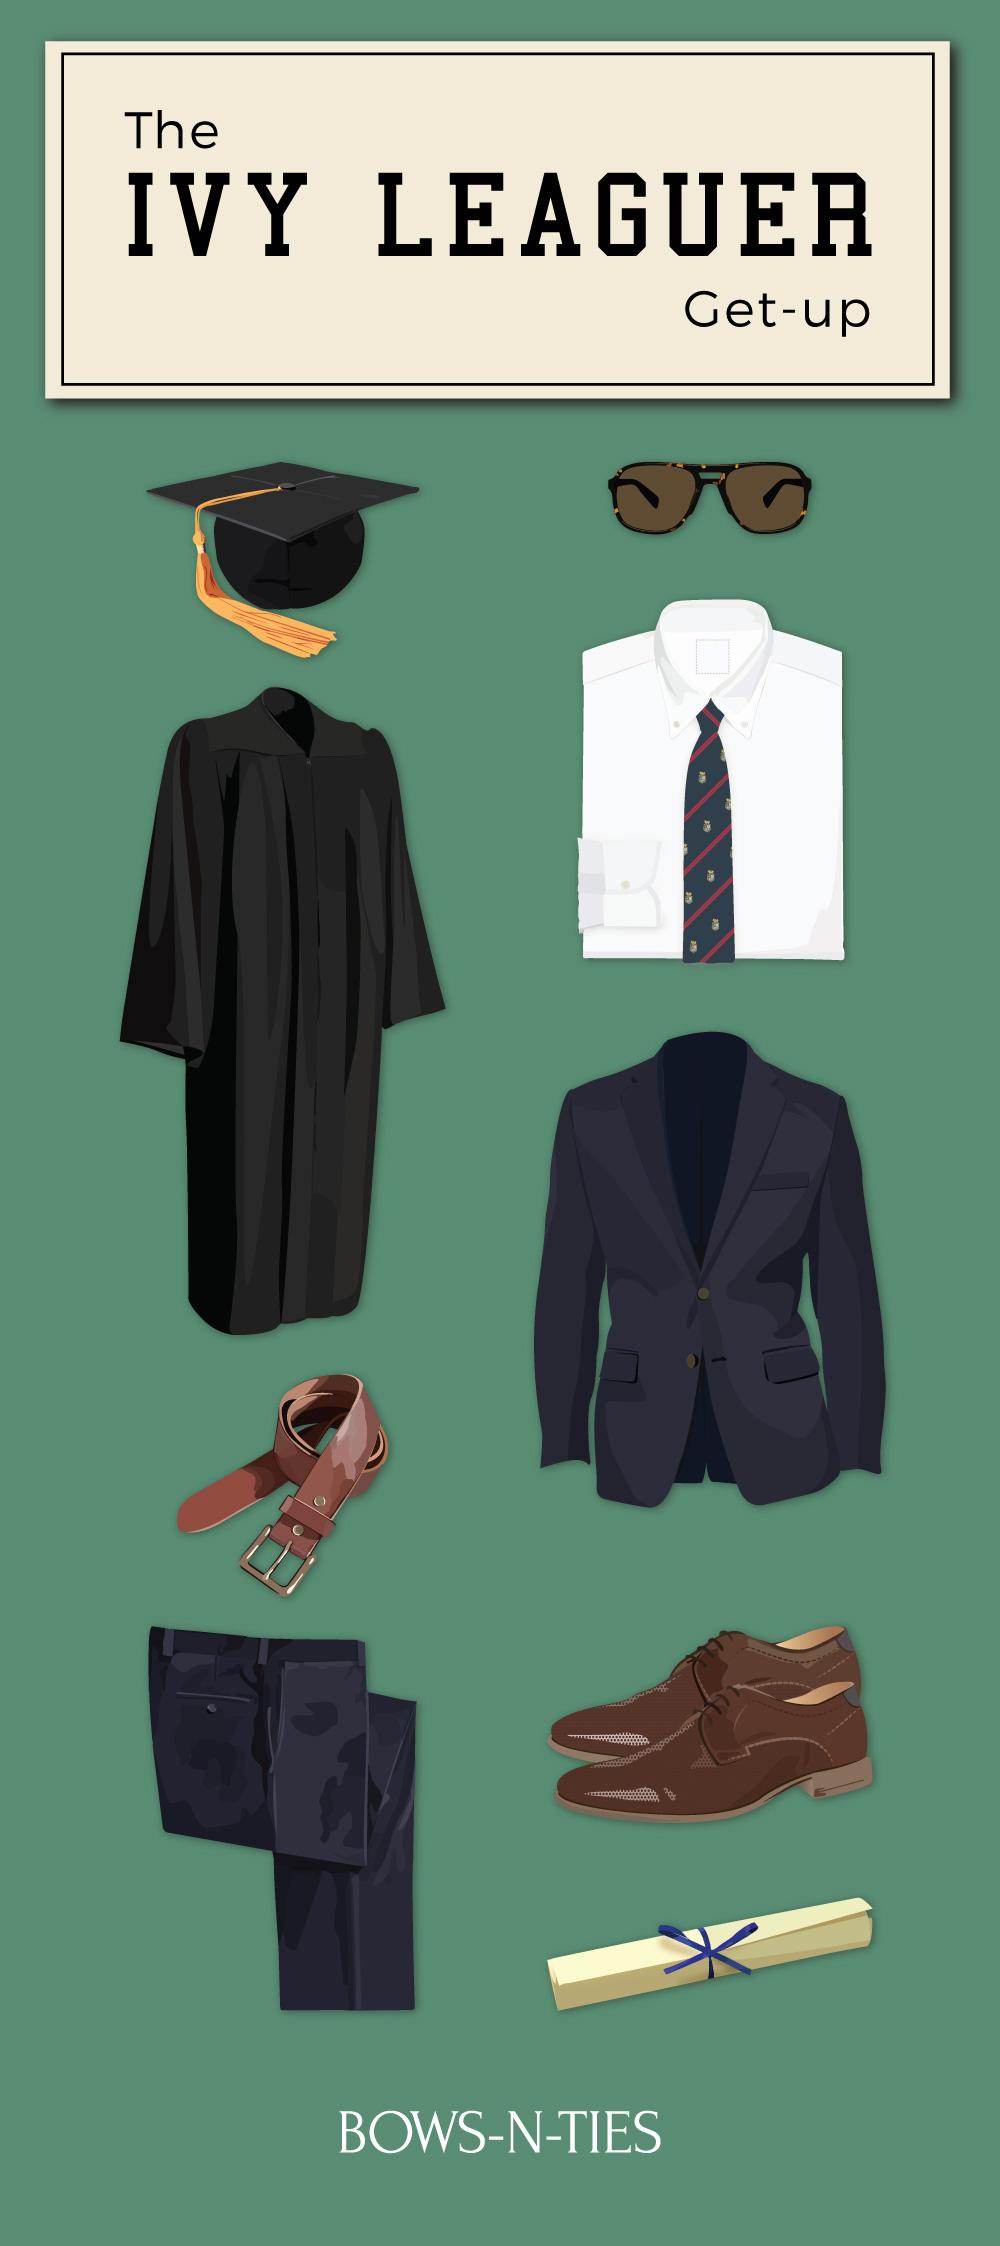 Dress Code Page 2 | Bows-N-Ties.com